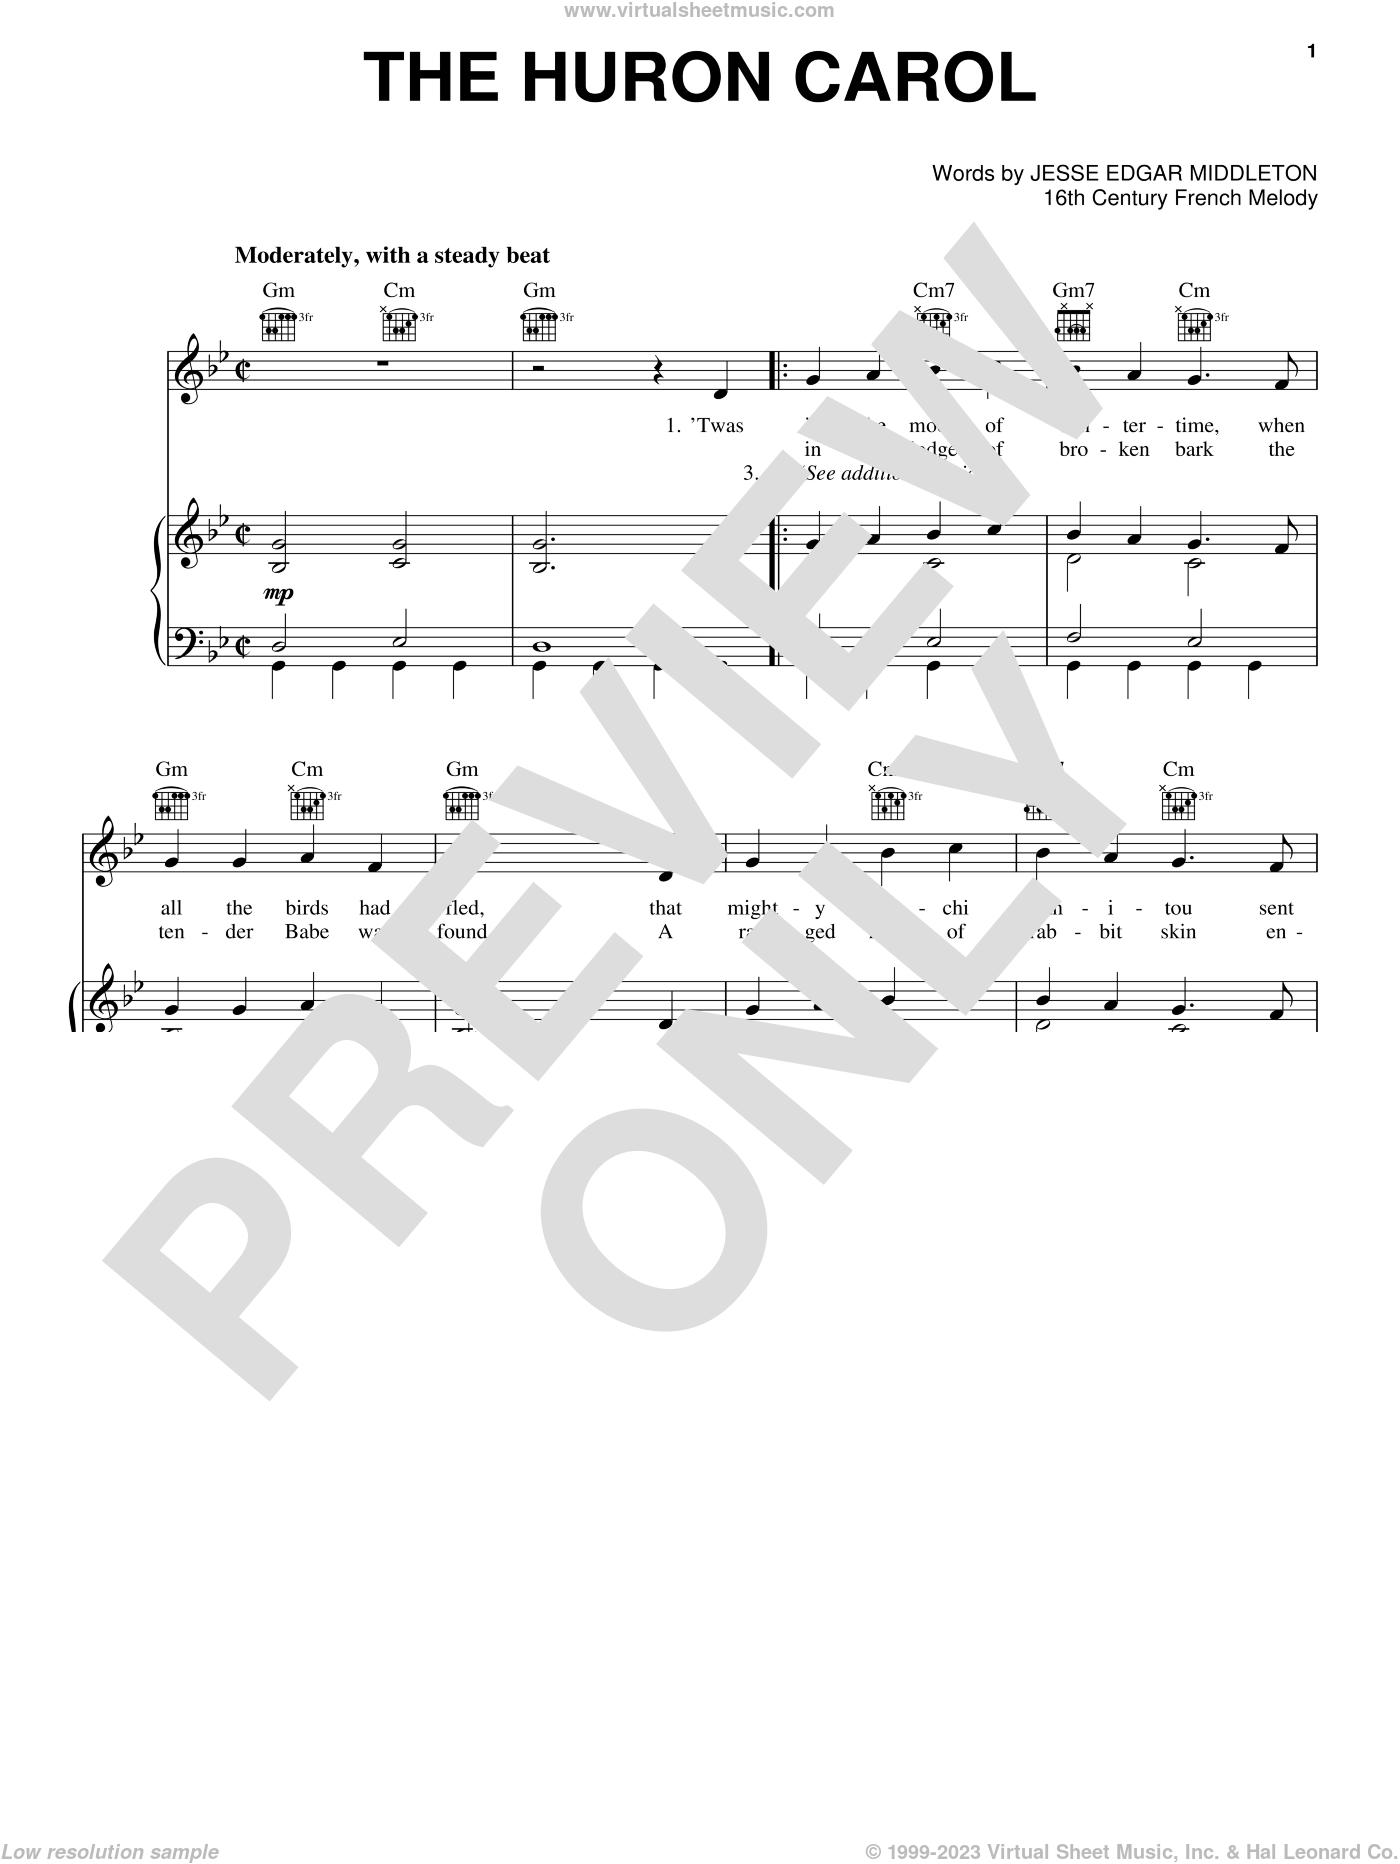 The Huron Carol sheet music for voice, piano or guitar, intermediate skill level